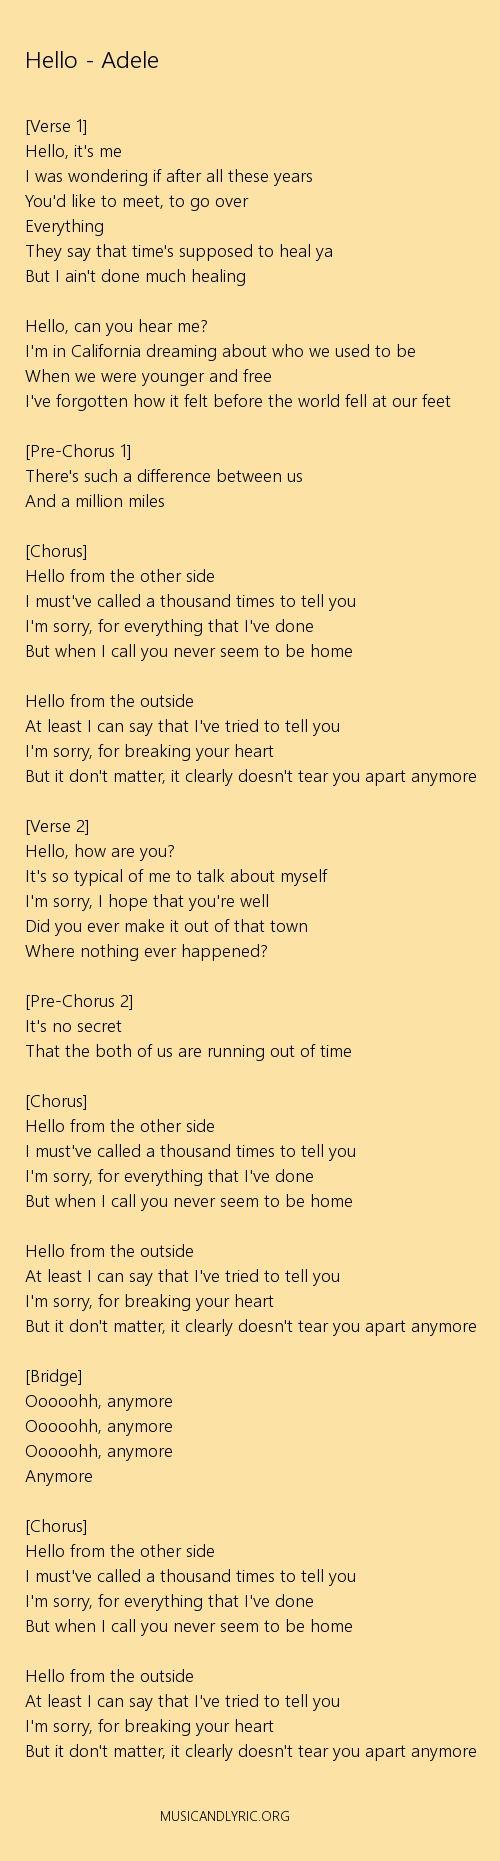 Adele - Hello lyrics, pdf - Musicandlyrics